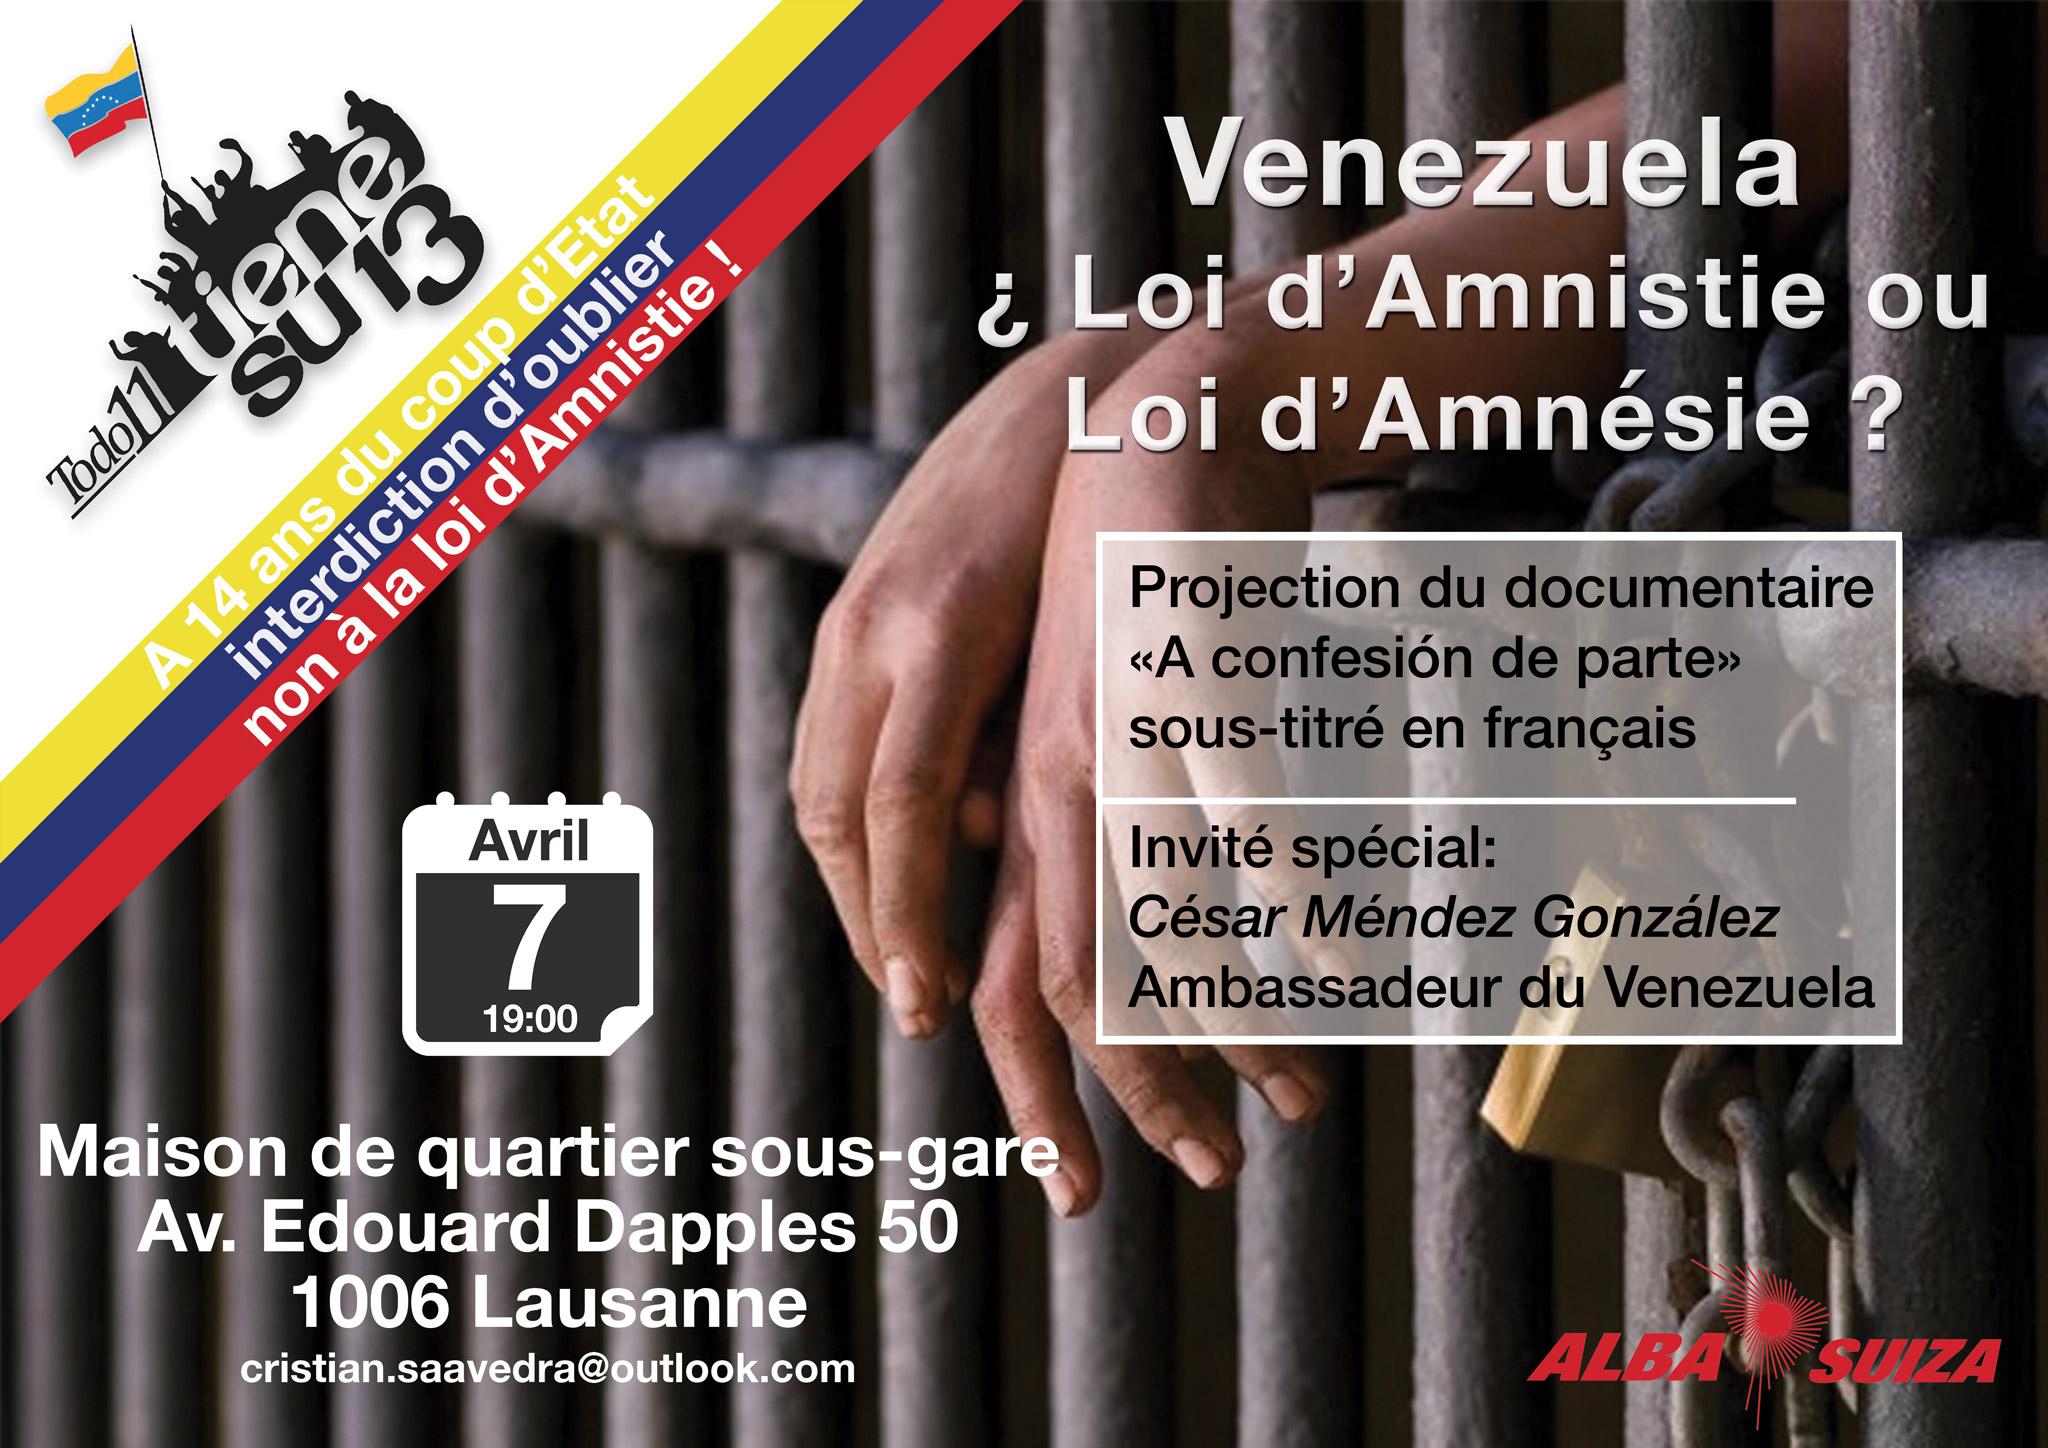 7 avril ALBA Suiza - Loi d'Amnistie au Venezuela